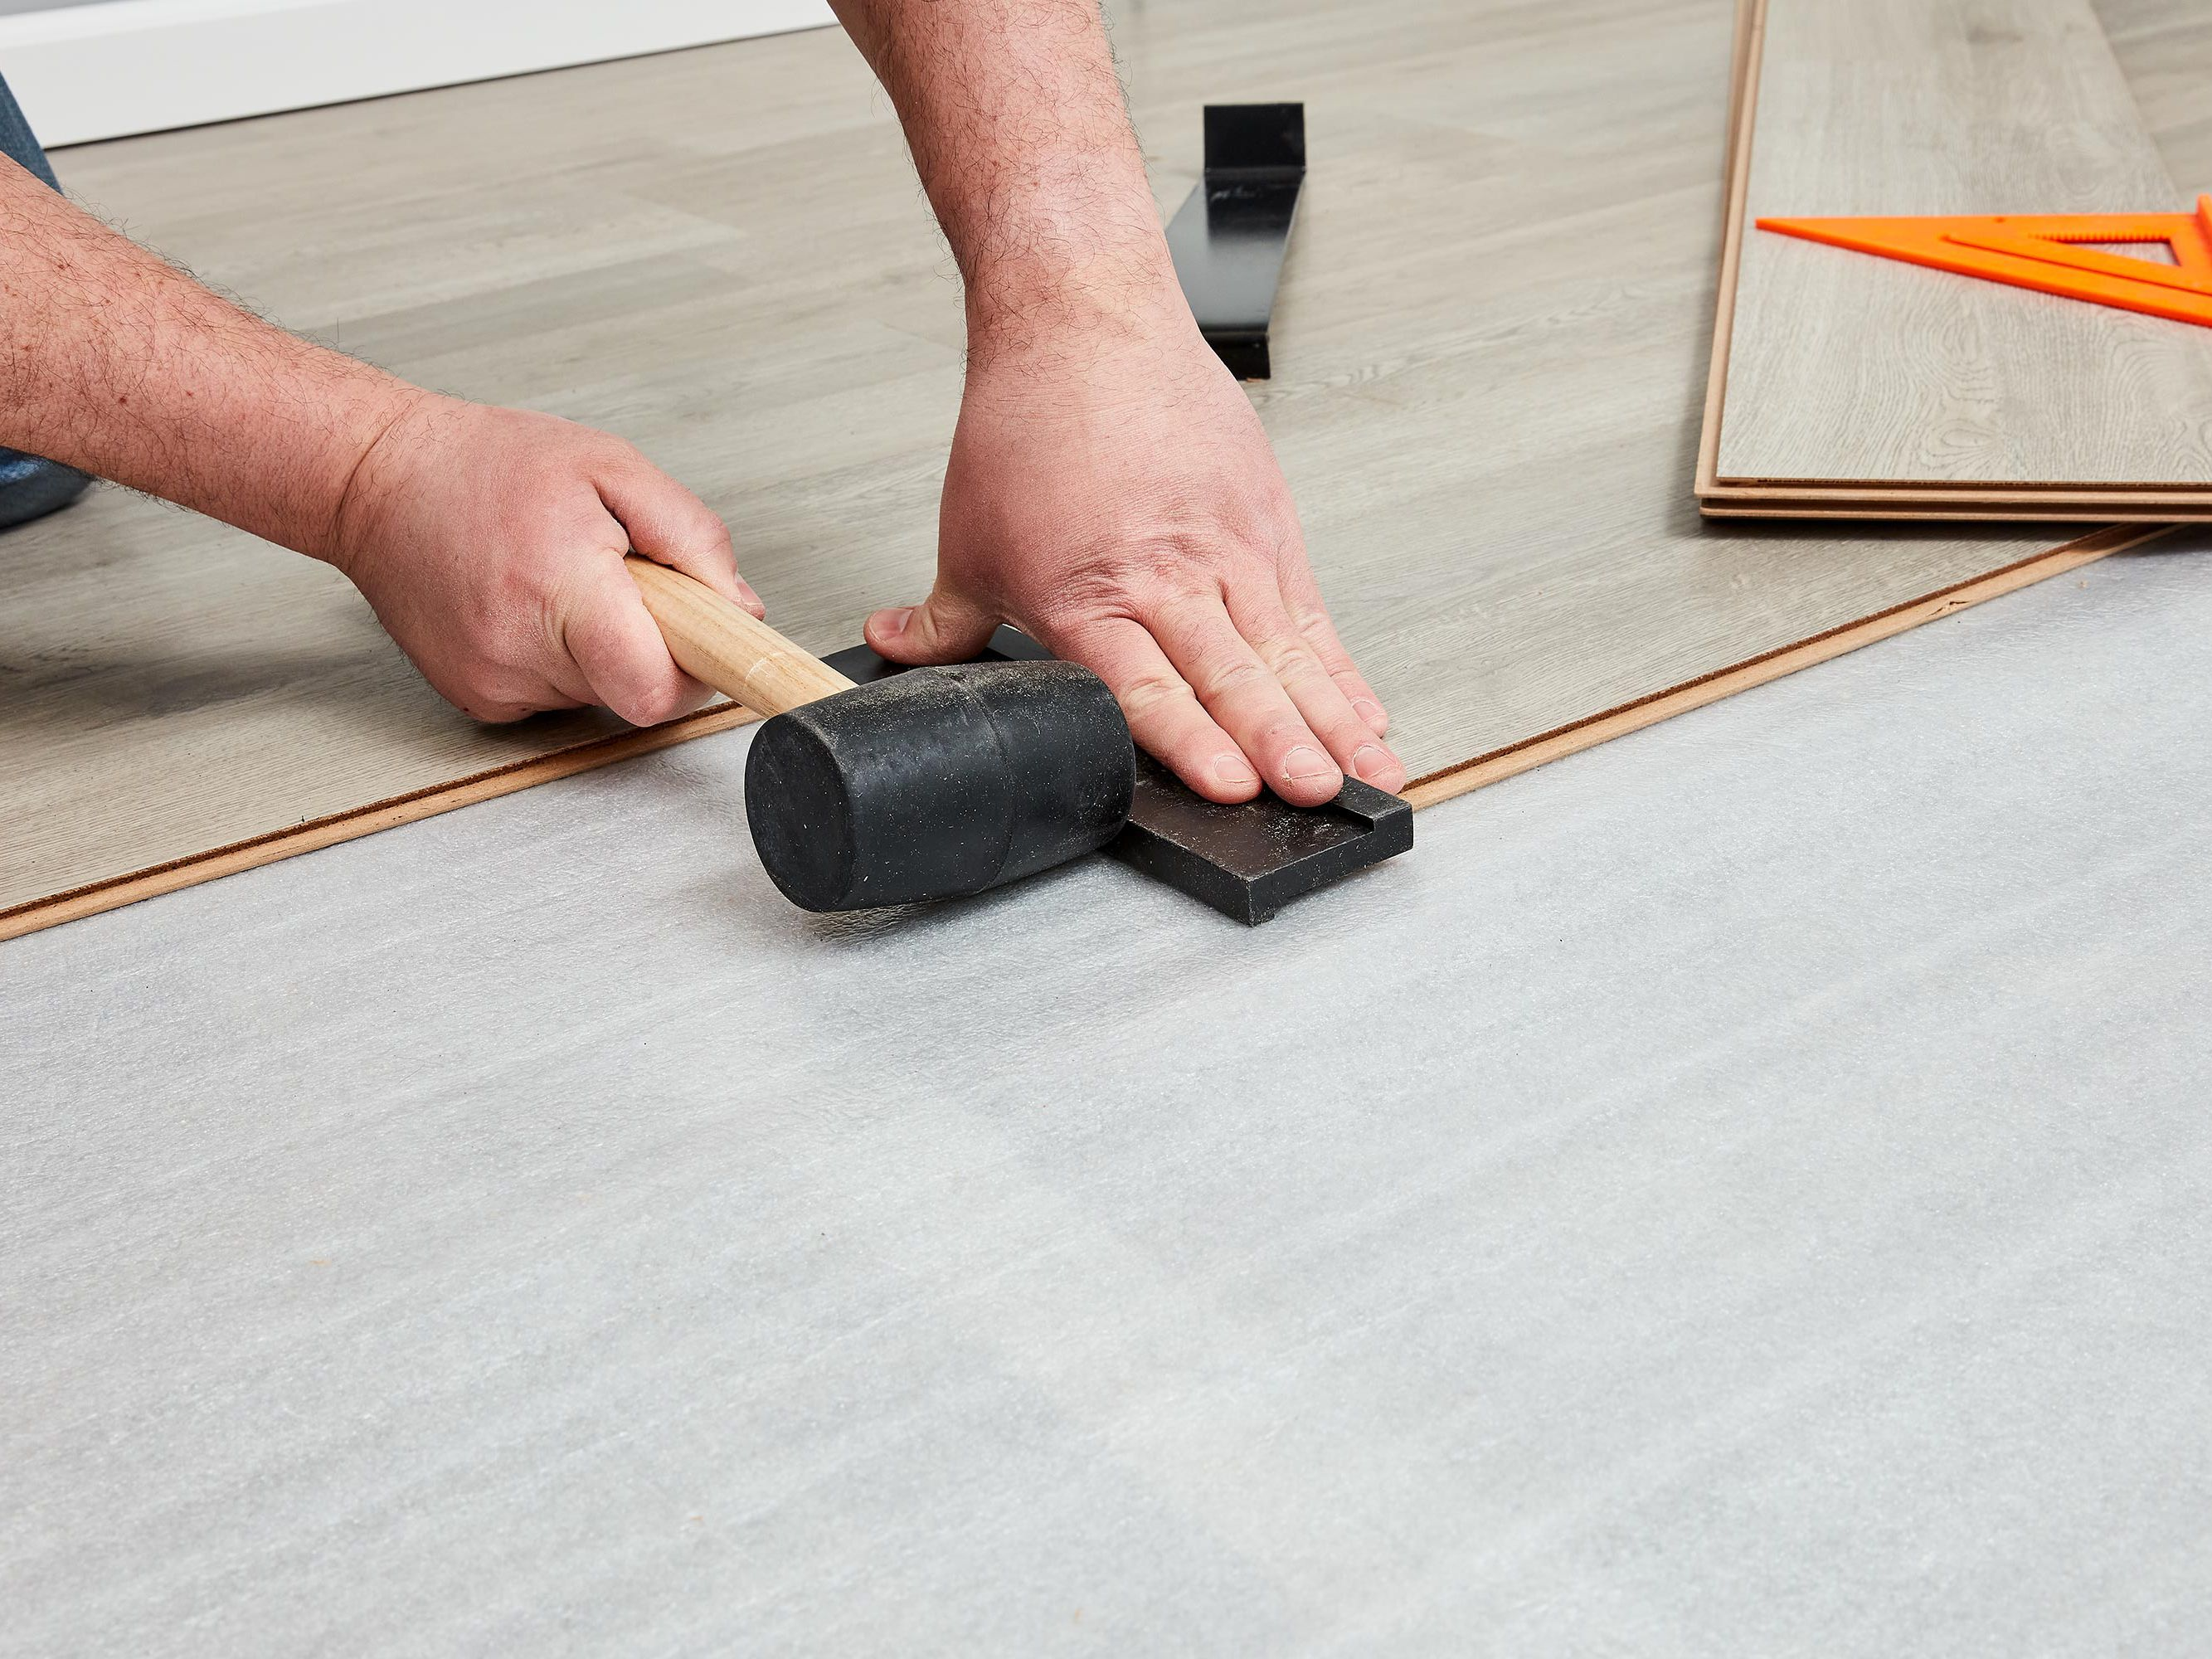 Best Underlayment For Laminate Flooring, Can You Put Laminate Flooring On Concrete Slab